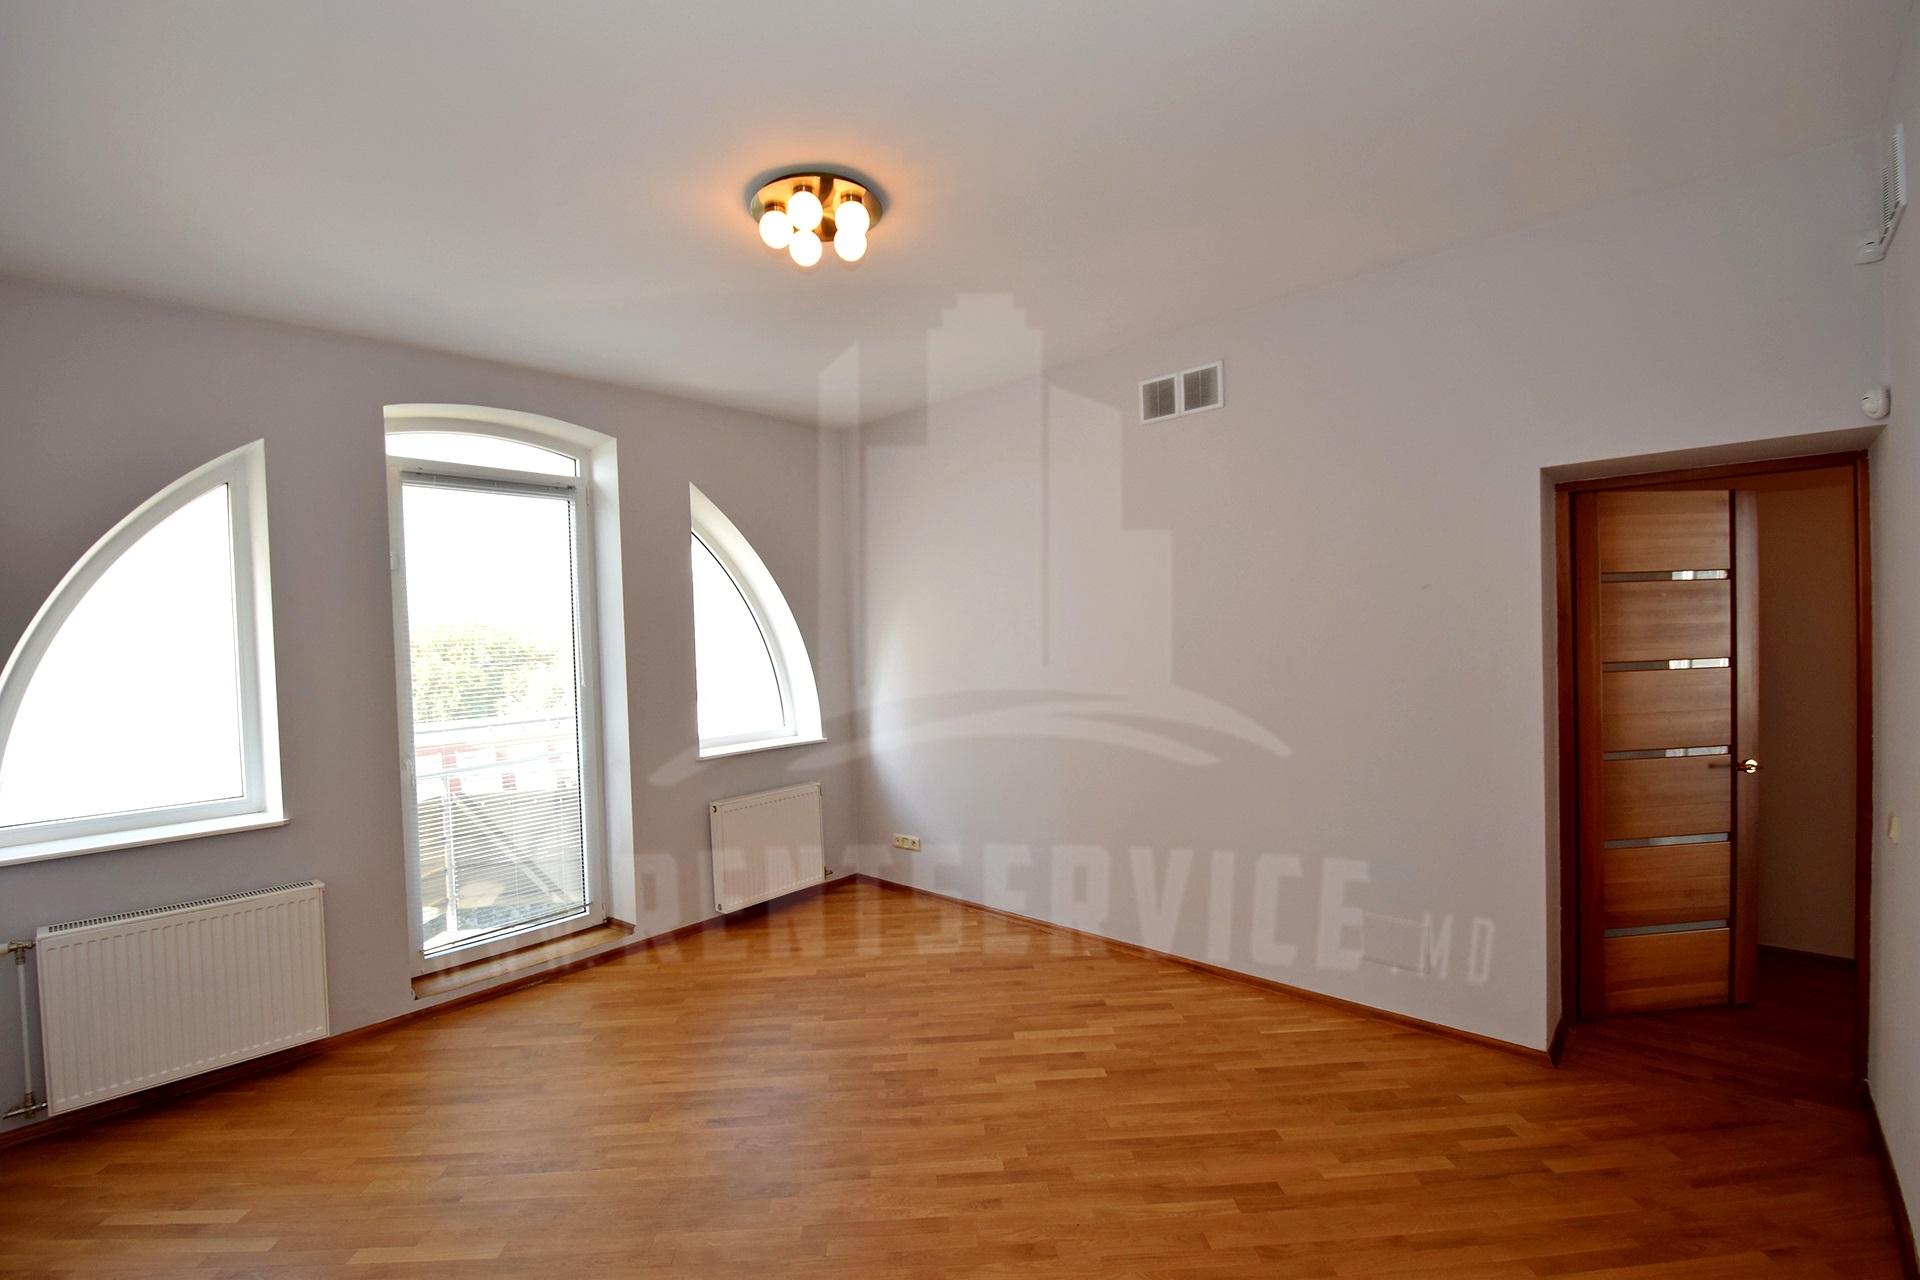 269_apartment_9.jpg